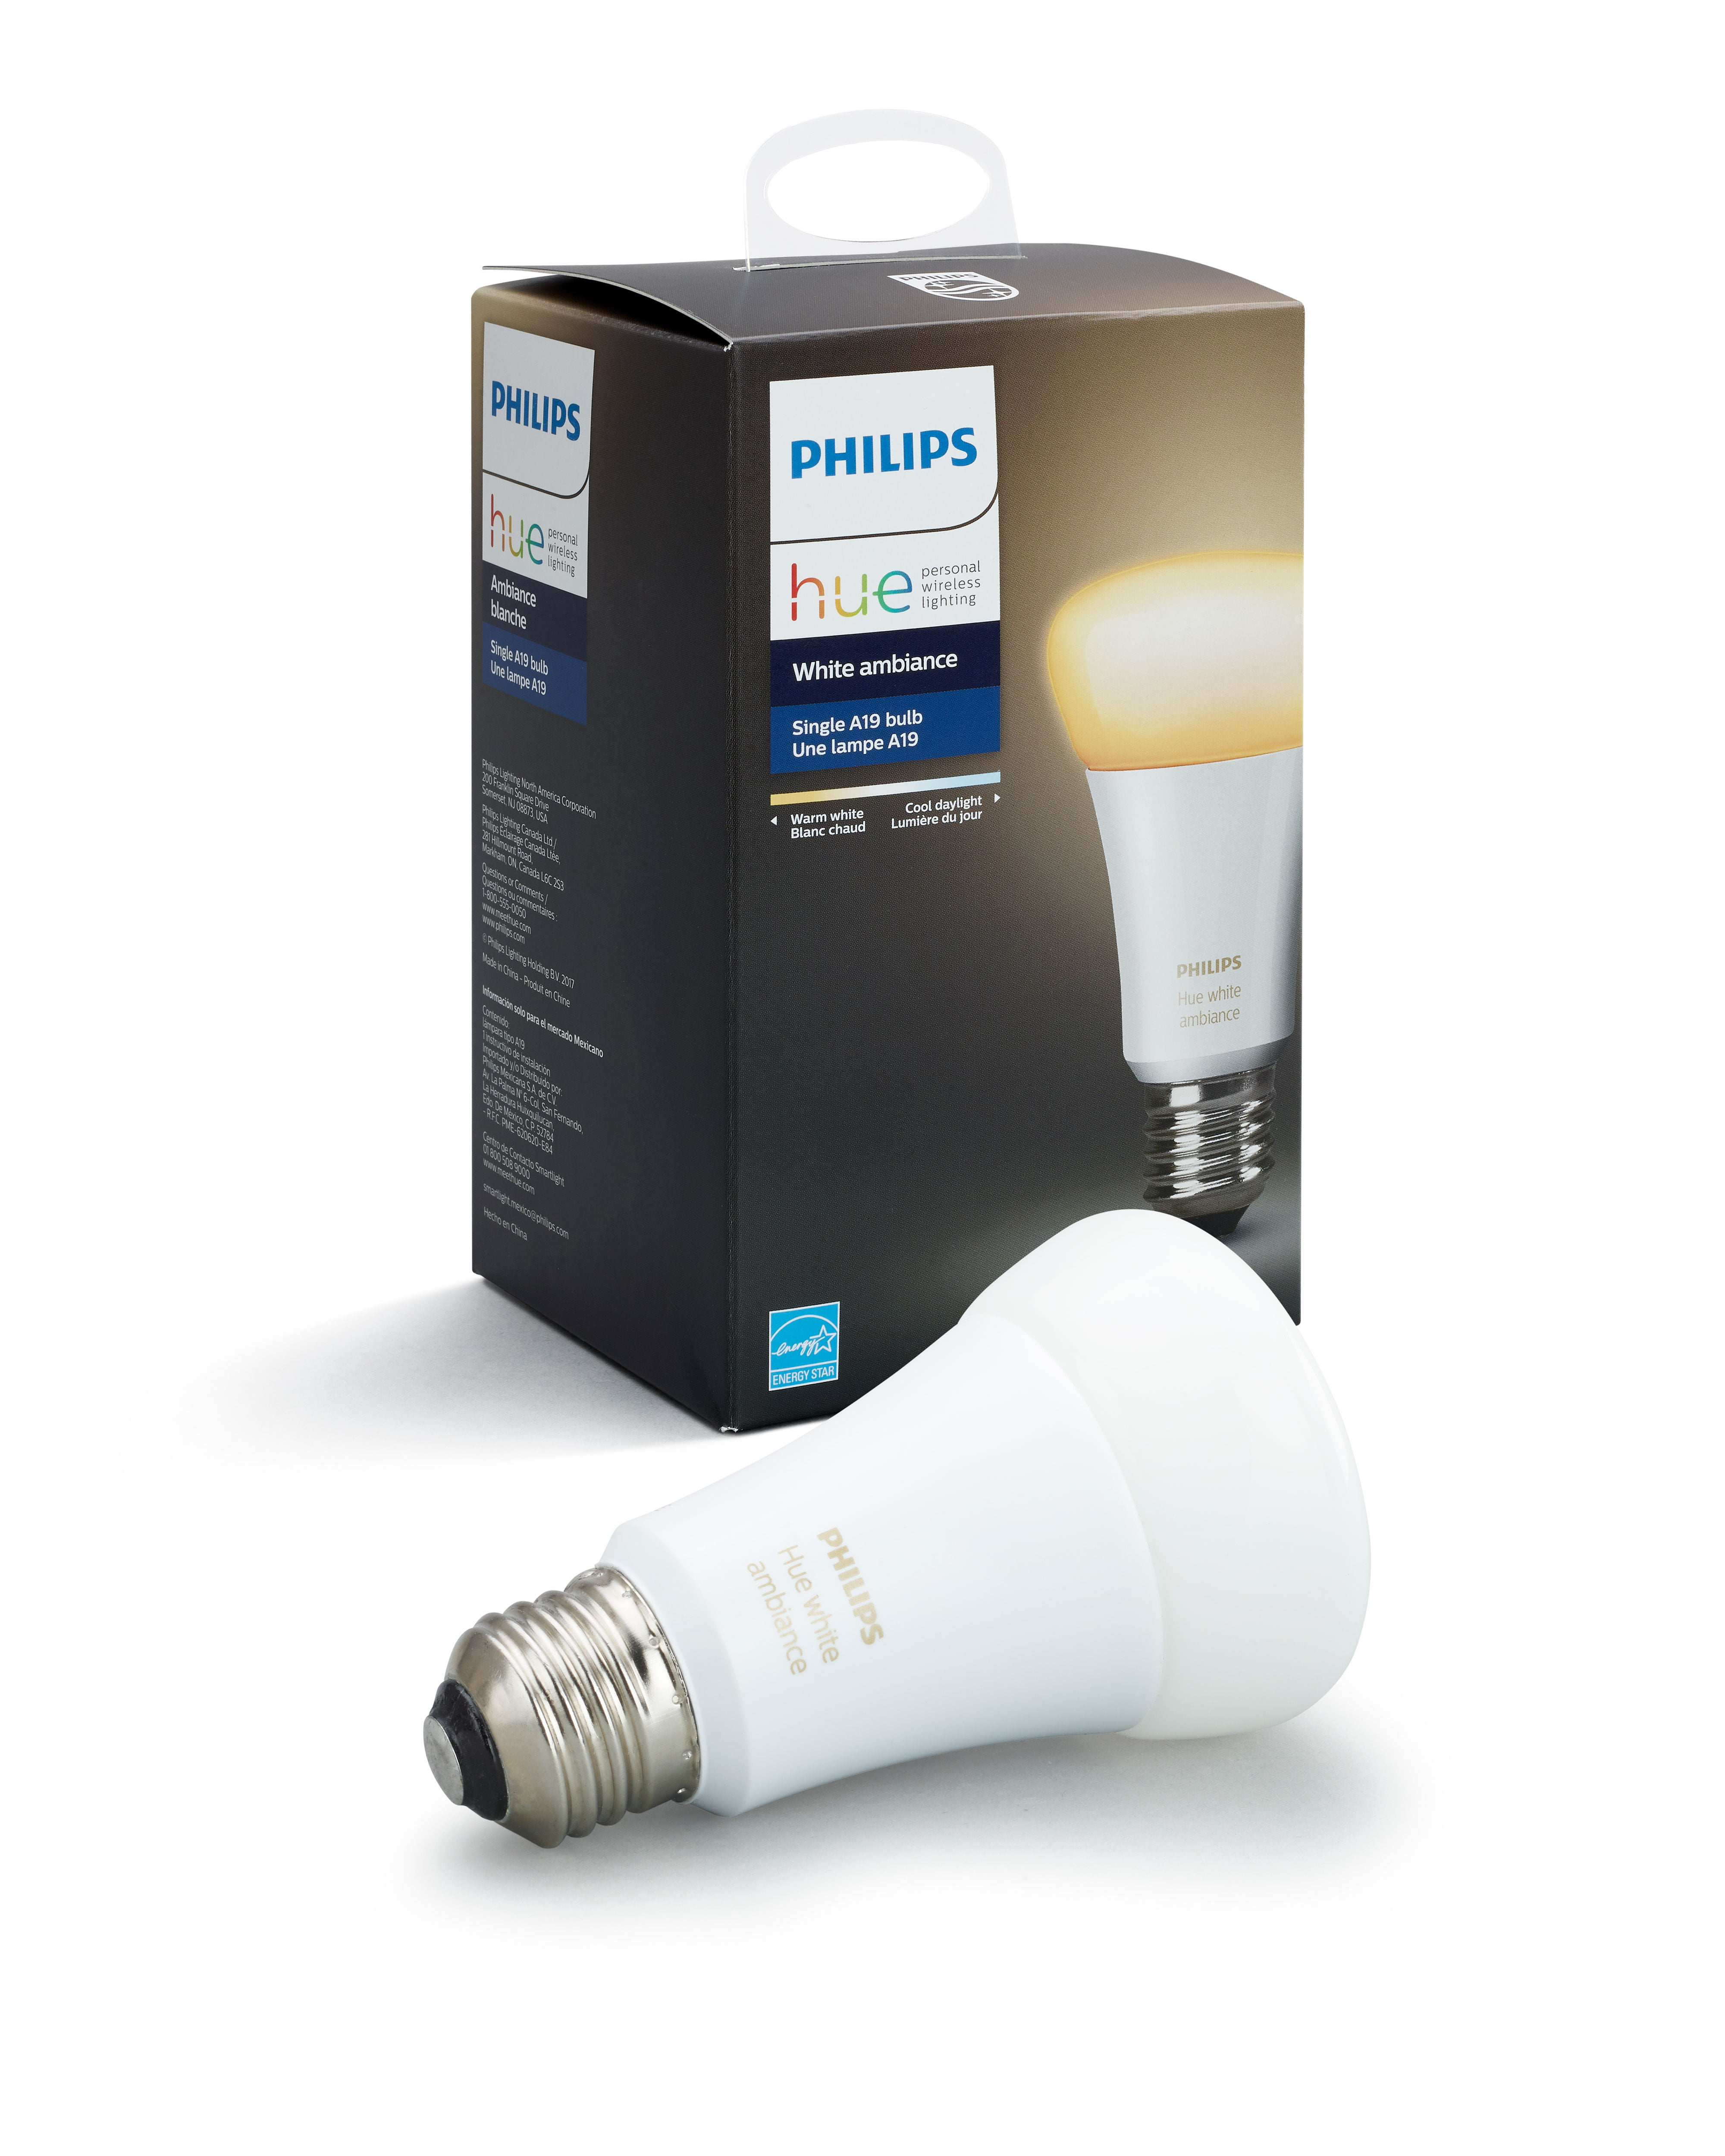 Philips Hue White Ambiance A19 LED Single Bulb